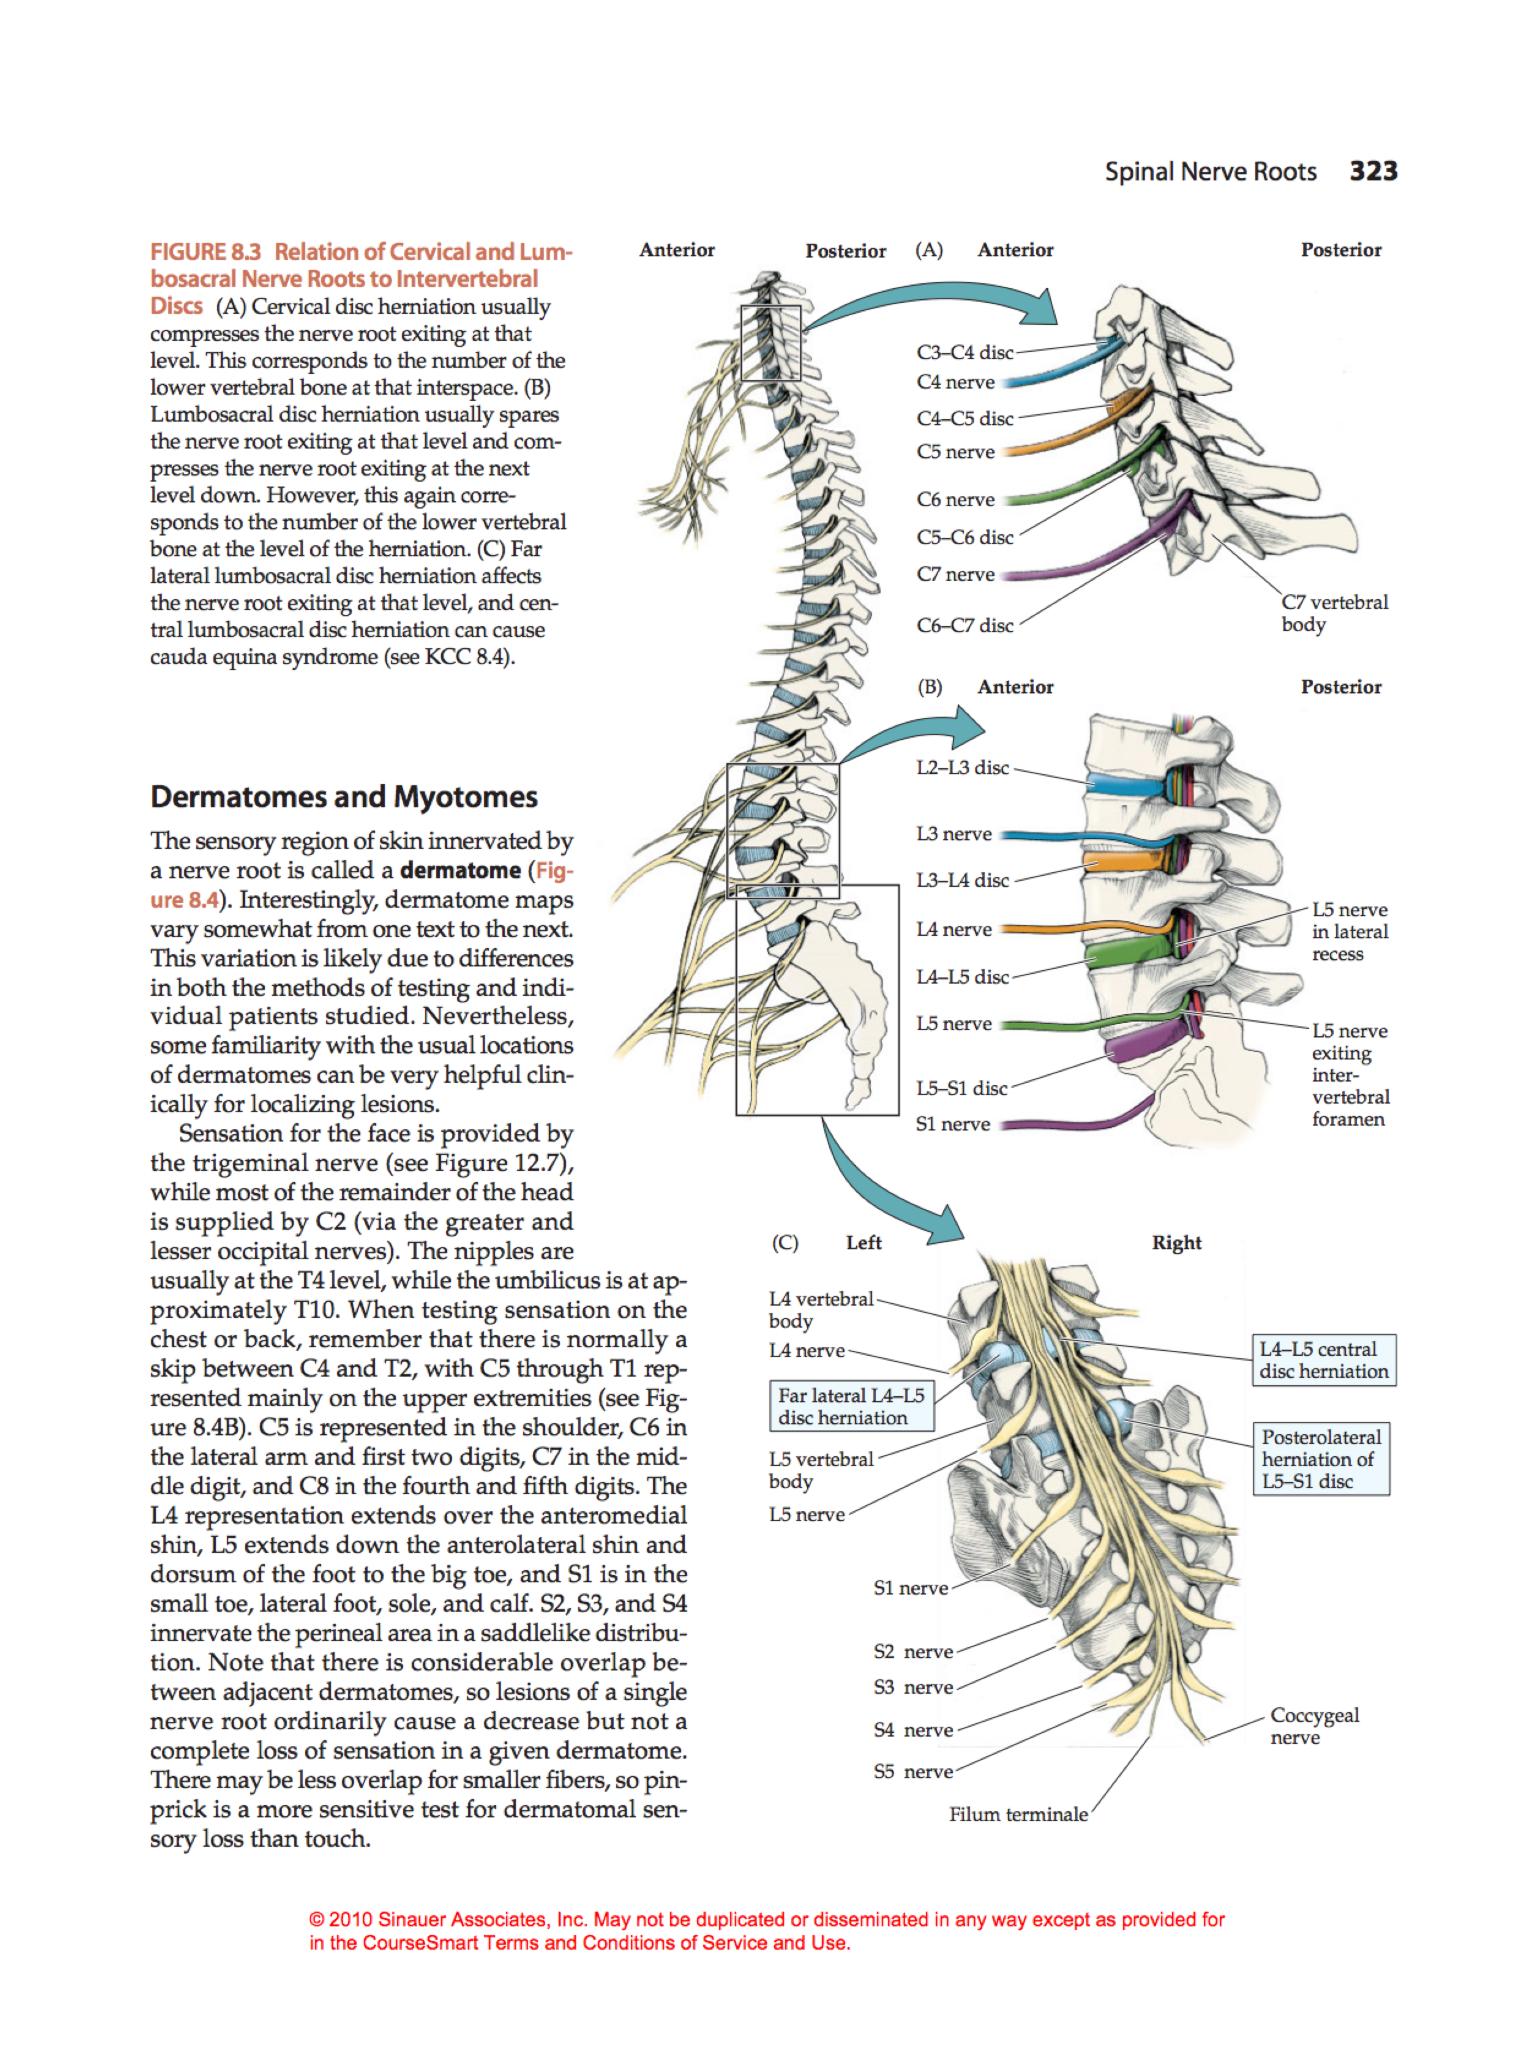 Pin By Jessica Eaton On Neurosurgery Pinterest